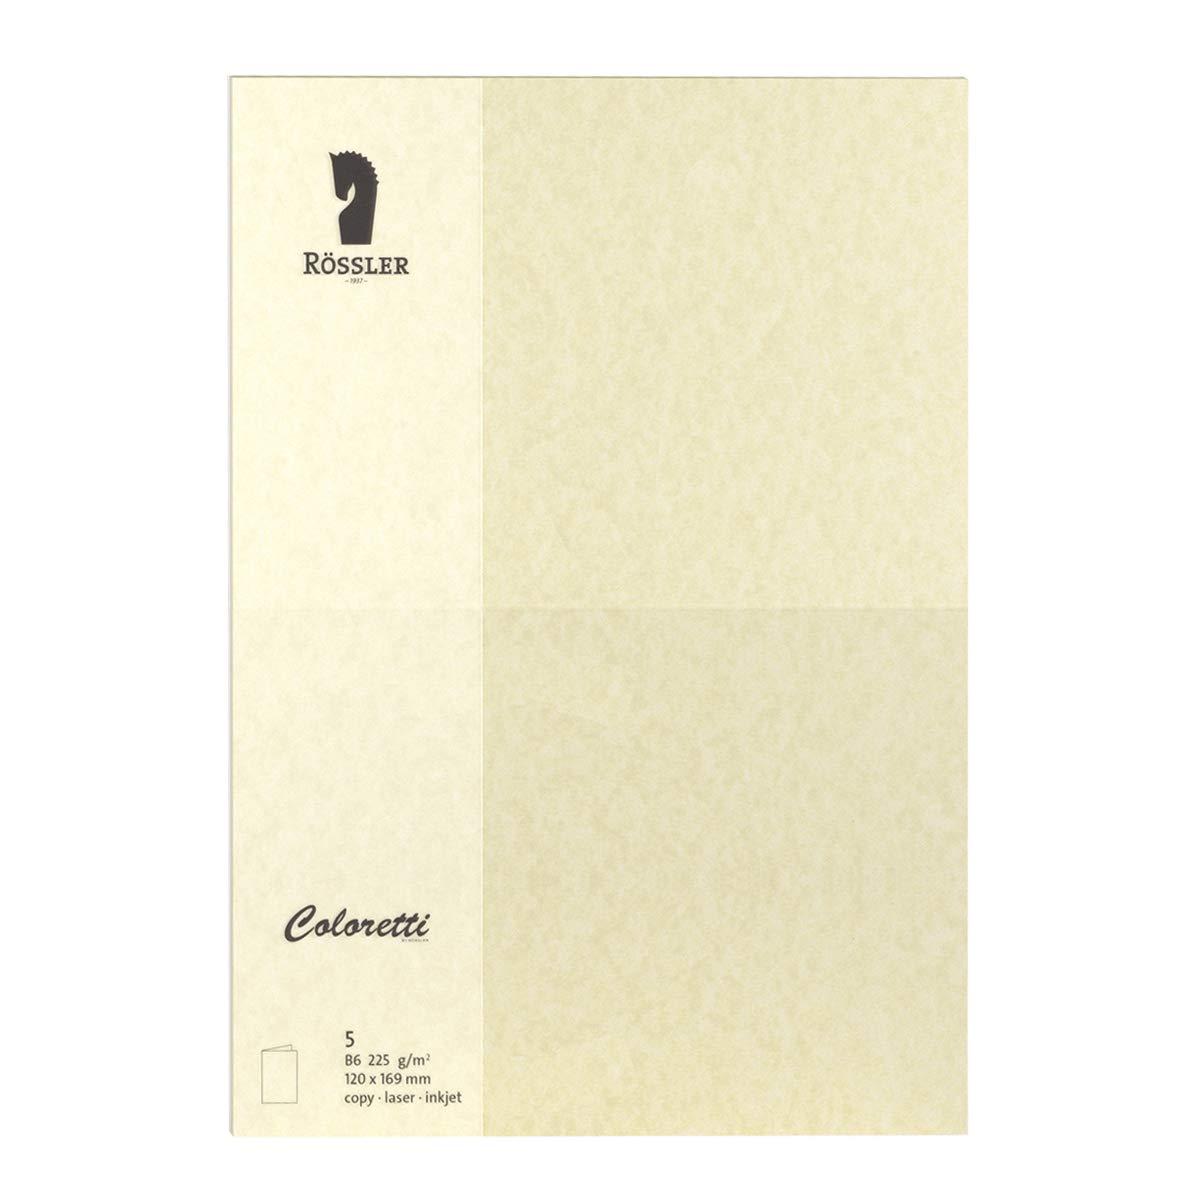 (saharabrown)  Rossler colorTTI Card 220 g m2, DIN Lang, Pack of 5) saharabrown